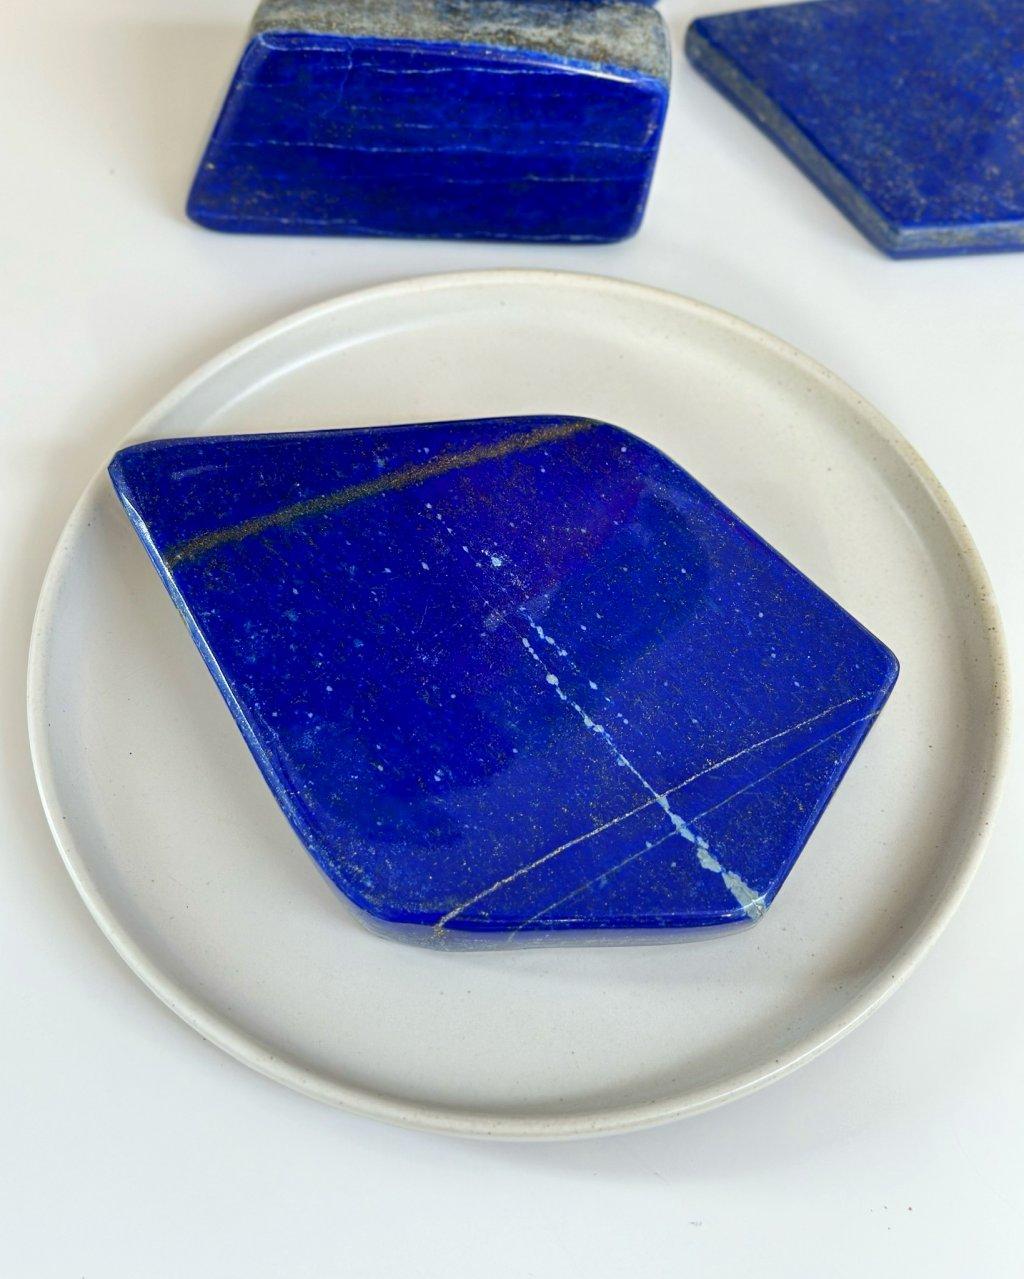 Lapis lazuli hlazený extra velký Afganistan